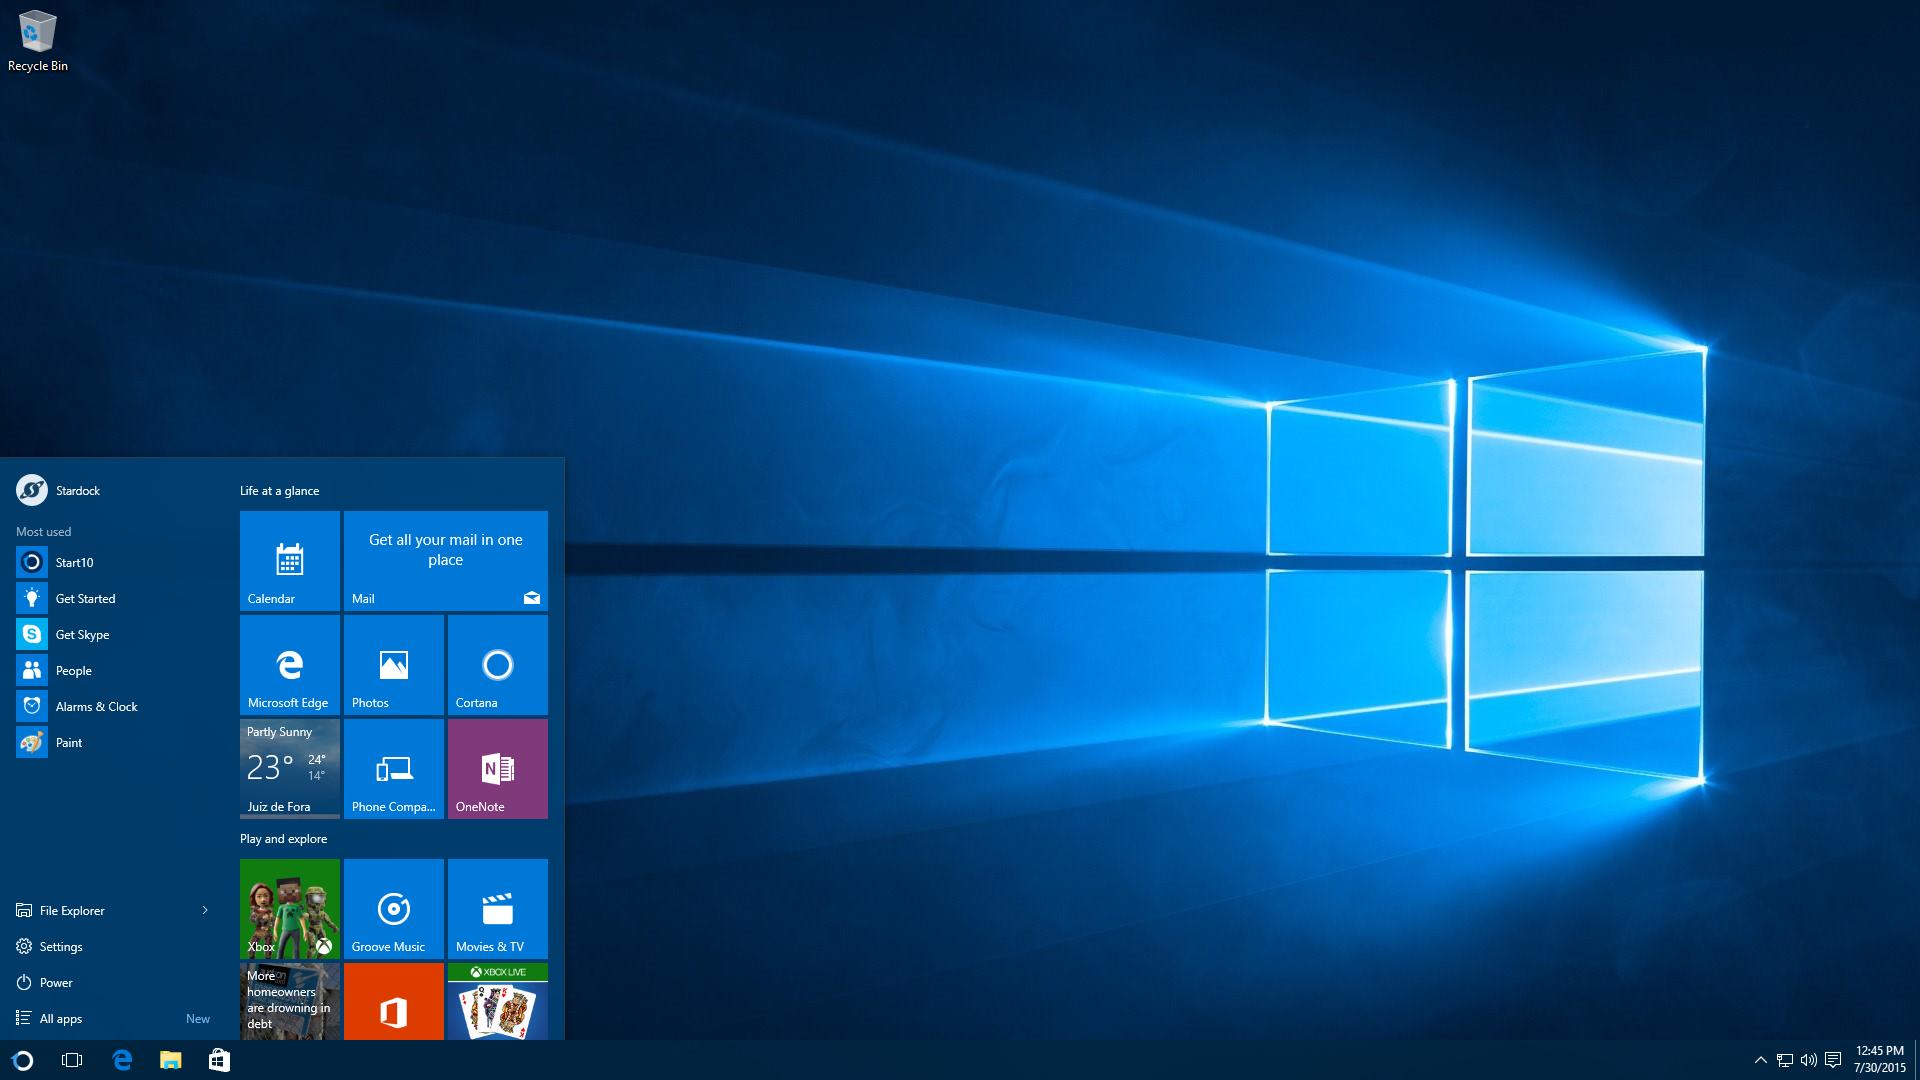 Stardock Windows 8 Start Menu Start Menu Windows 10